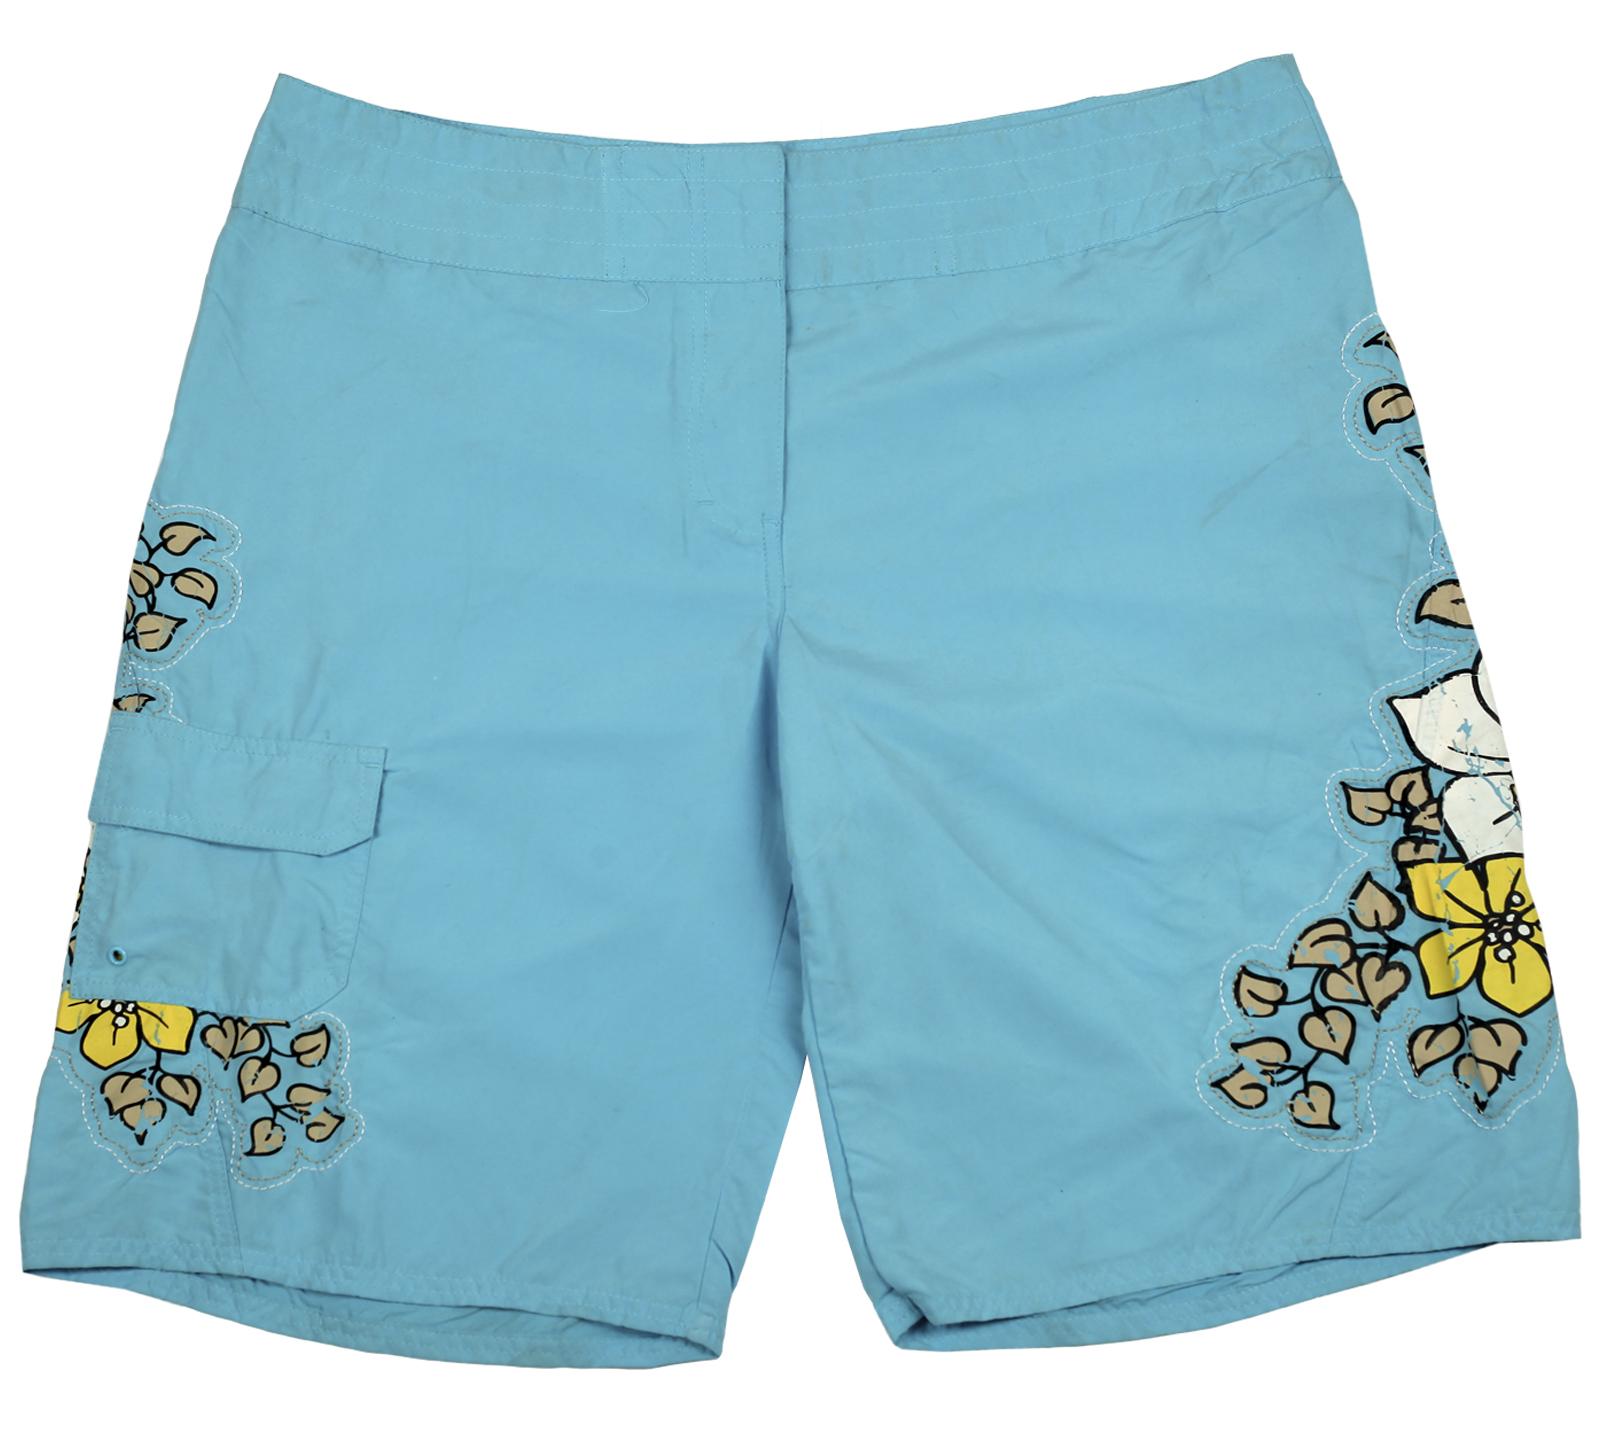 Яркие голубые шорты West Coast